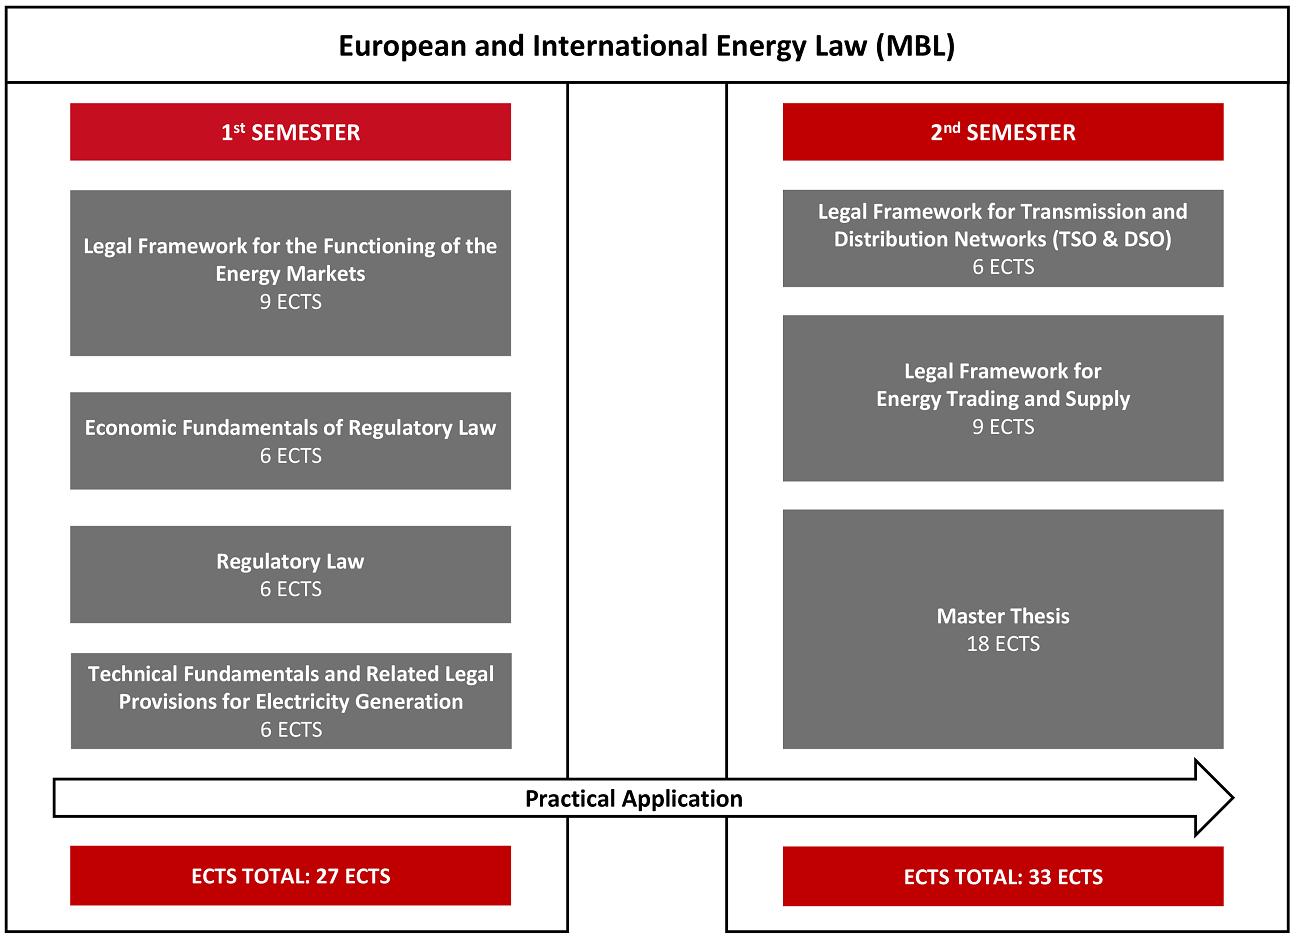 European and International Energy Law (MBL) European and International Energy Law MBL